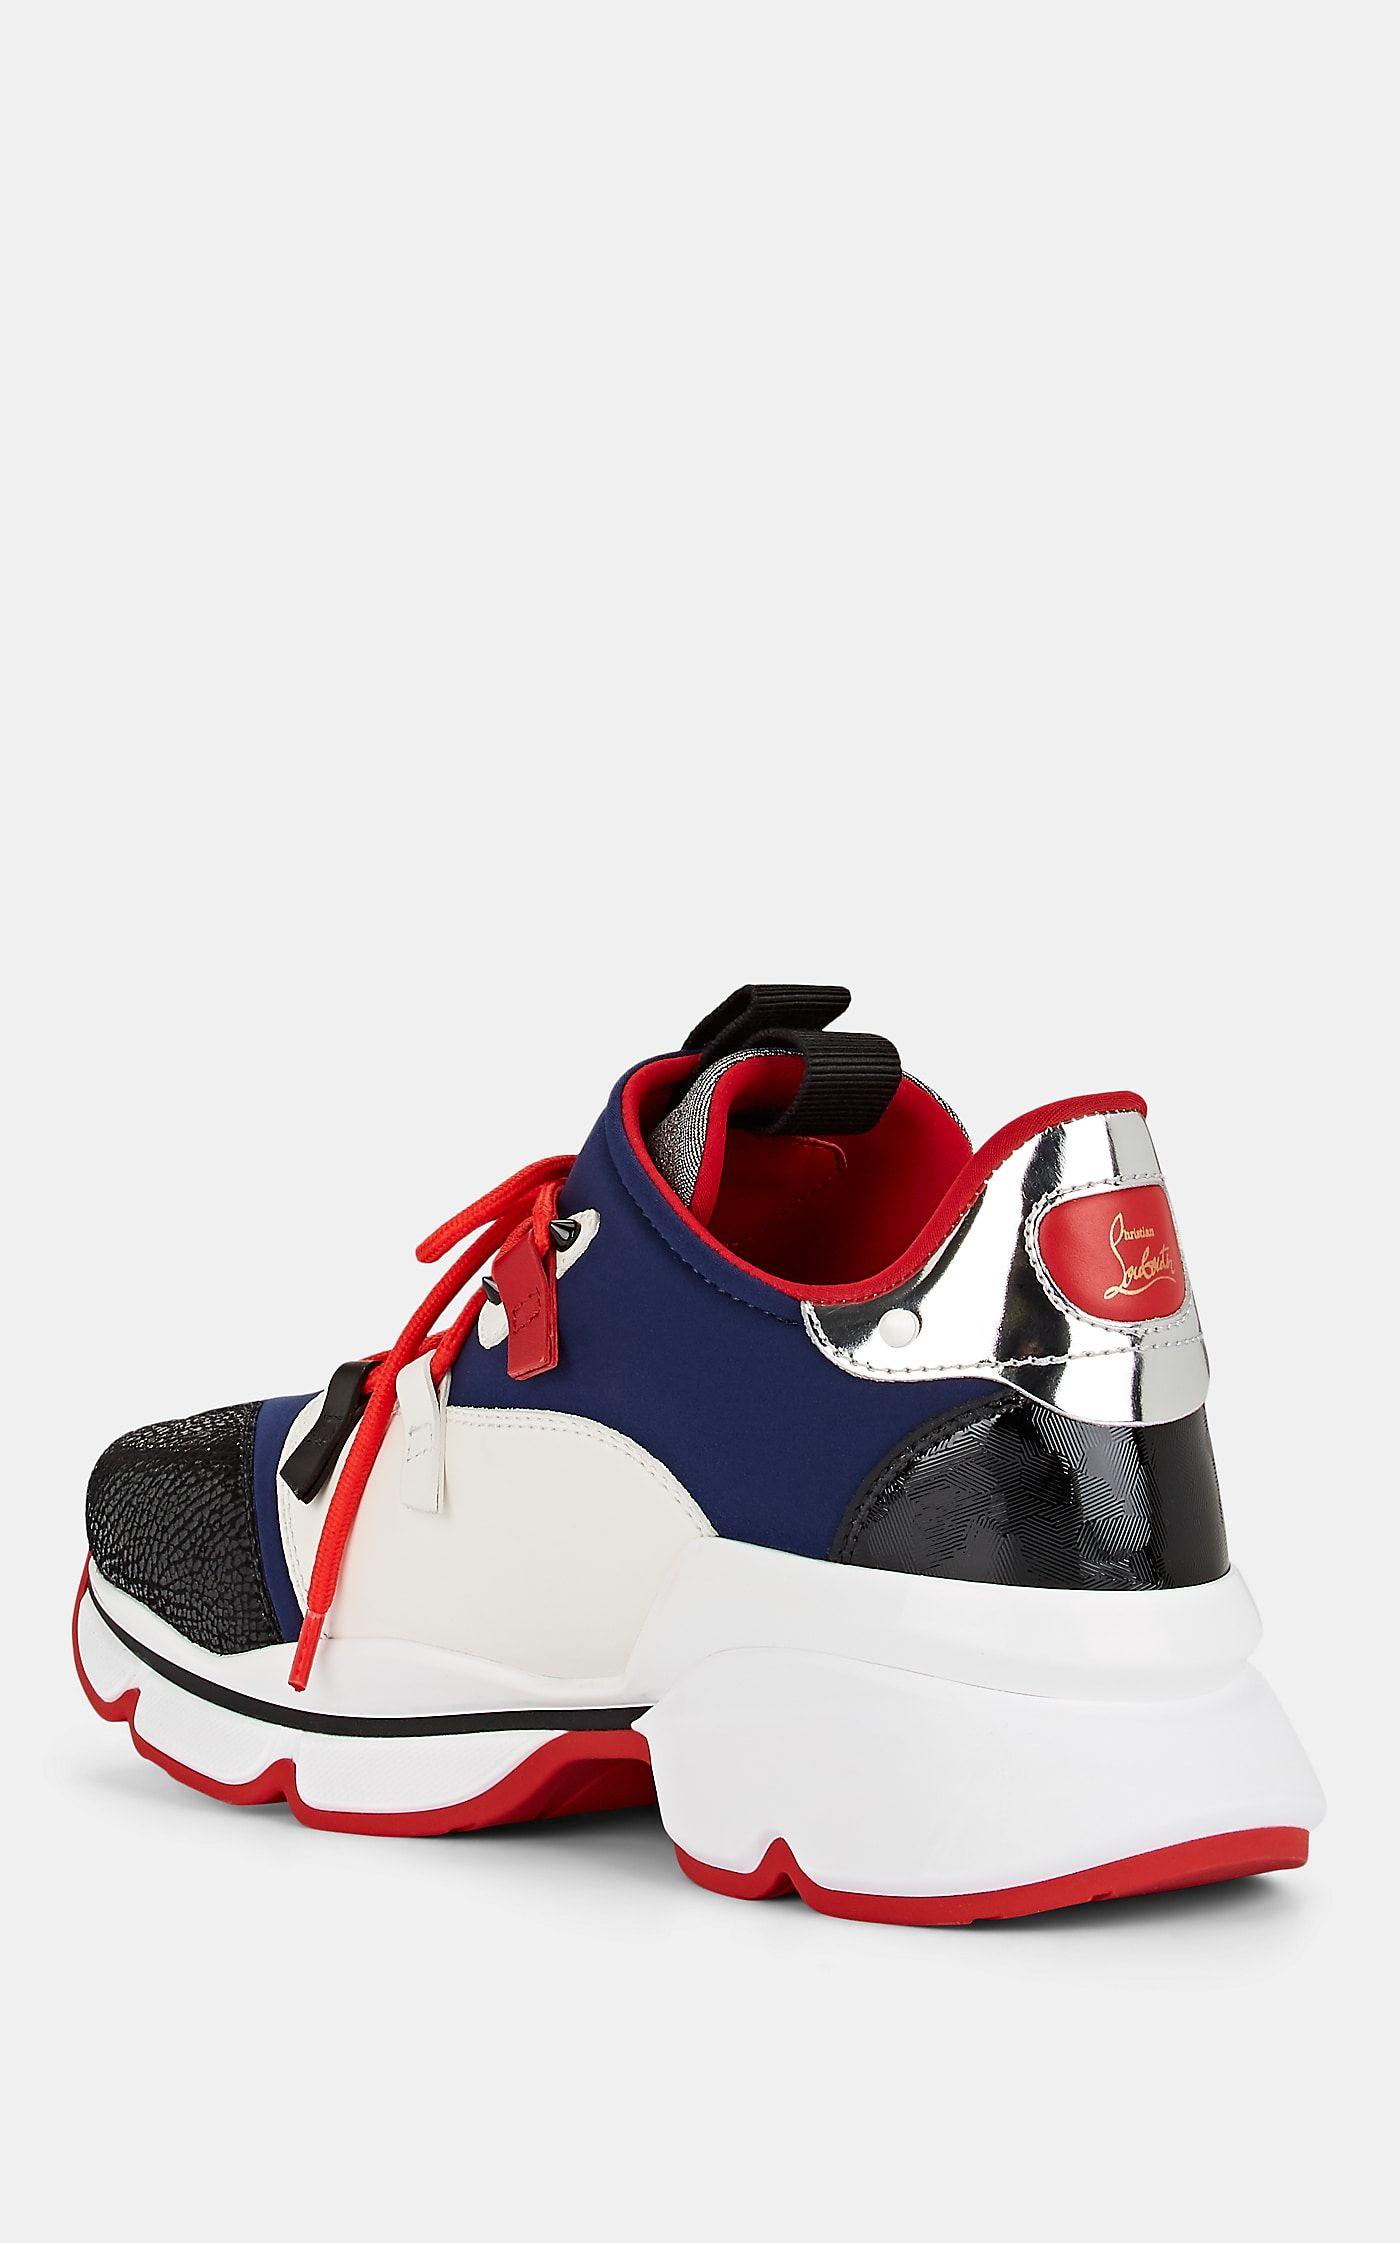 9f18537fb6b5 Christian Louboutin Men s Red-Runner Mixed-Material Sneakers - Navy ...